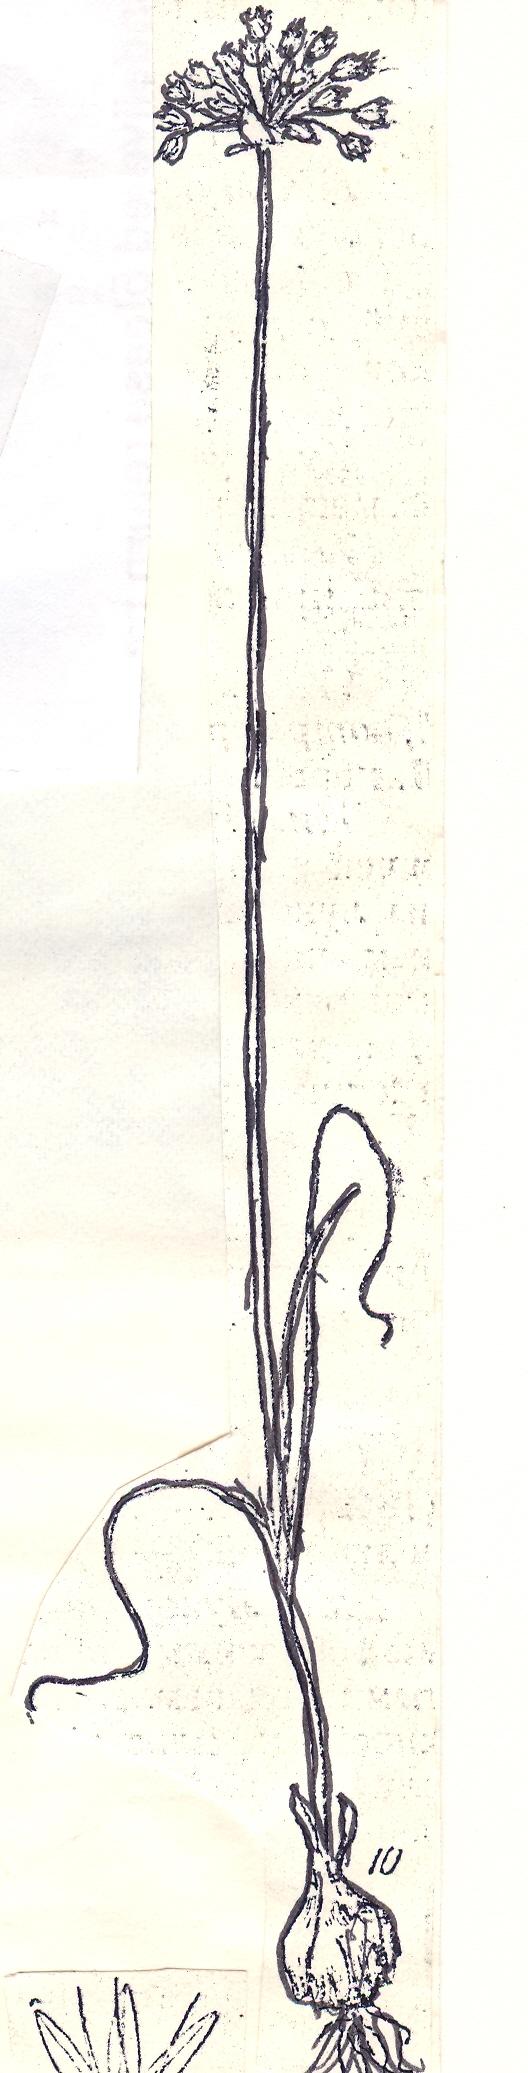 Allium%20vvedenskyanum.jpg